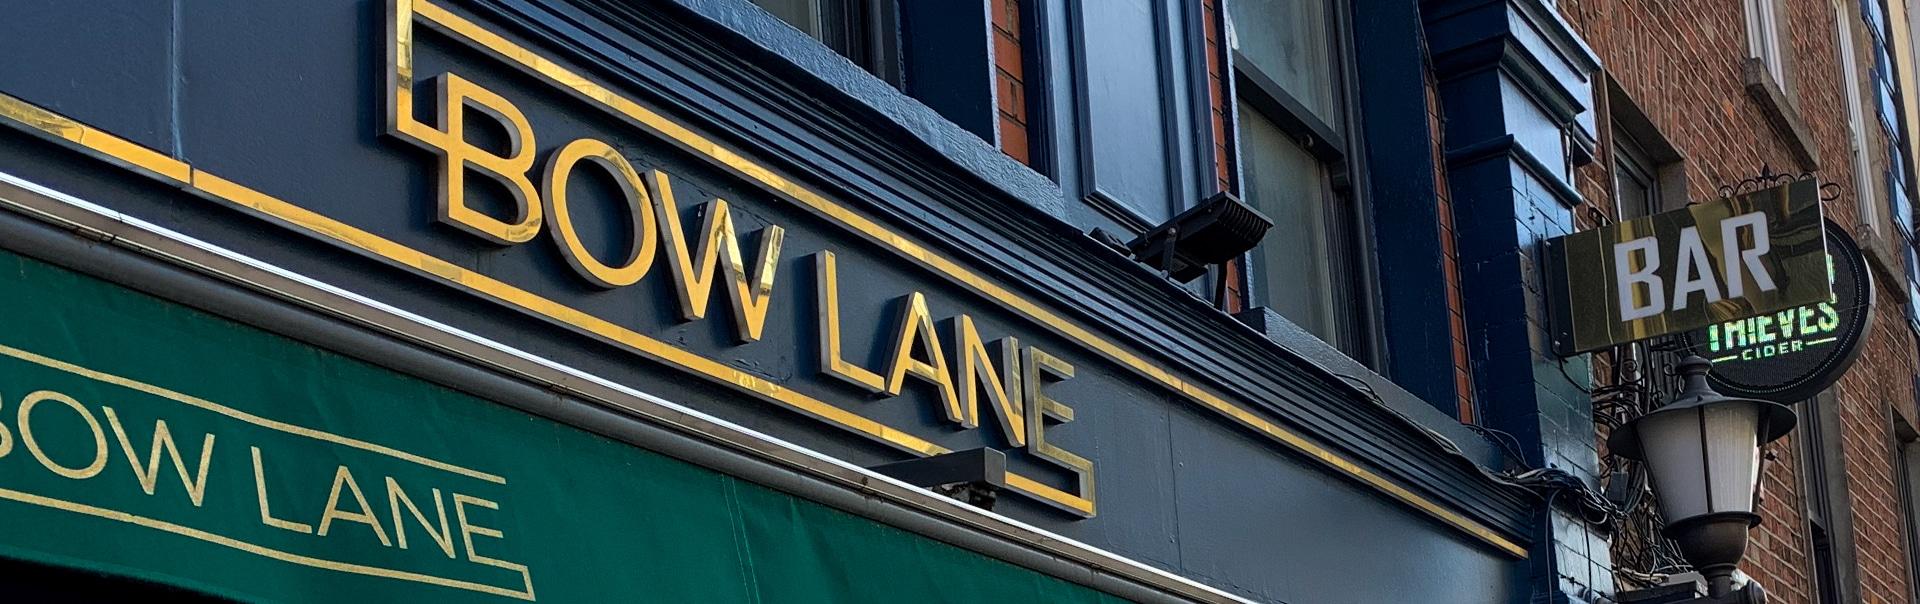 Side-lit storefront-sign at Bow_Lane_cocktail_bar, Dublin